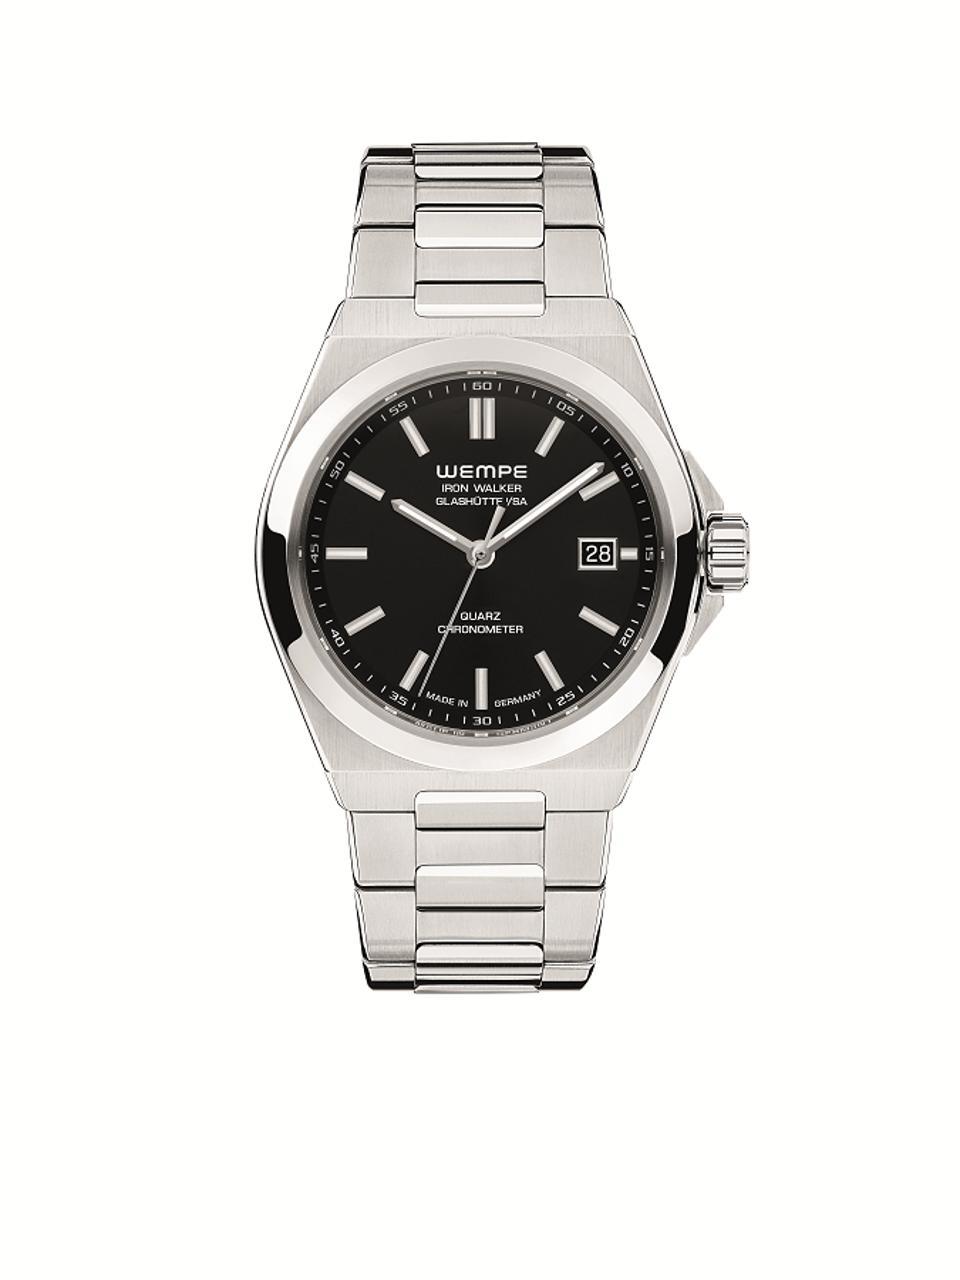 Iron Walker Quartz Men's Watch with black dial